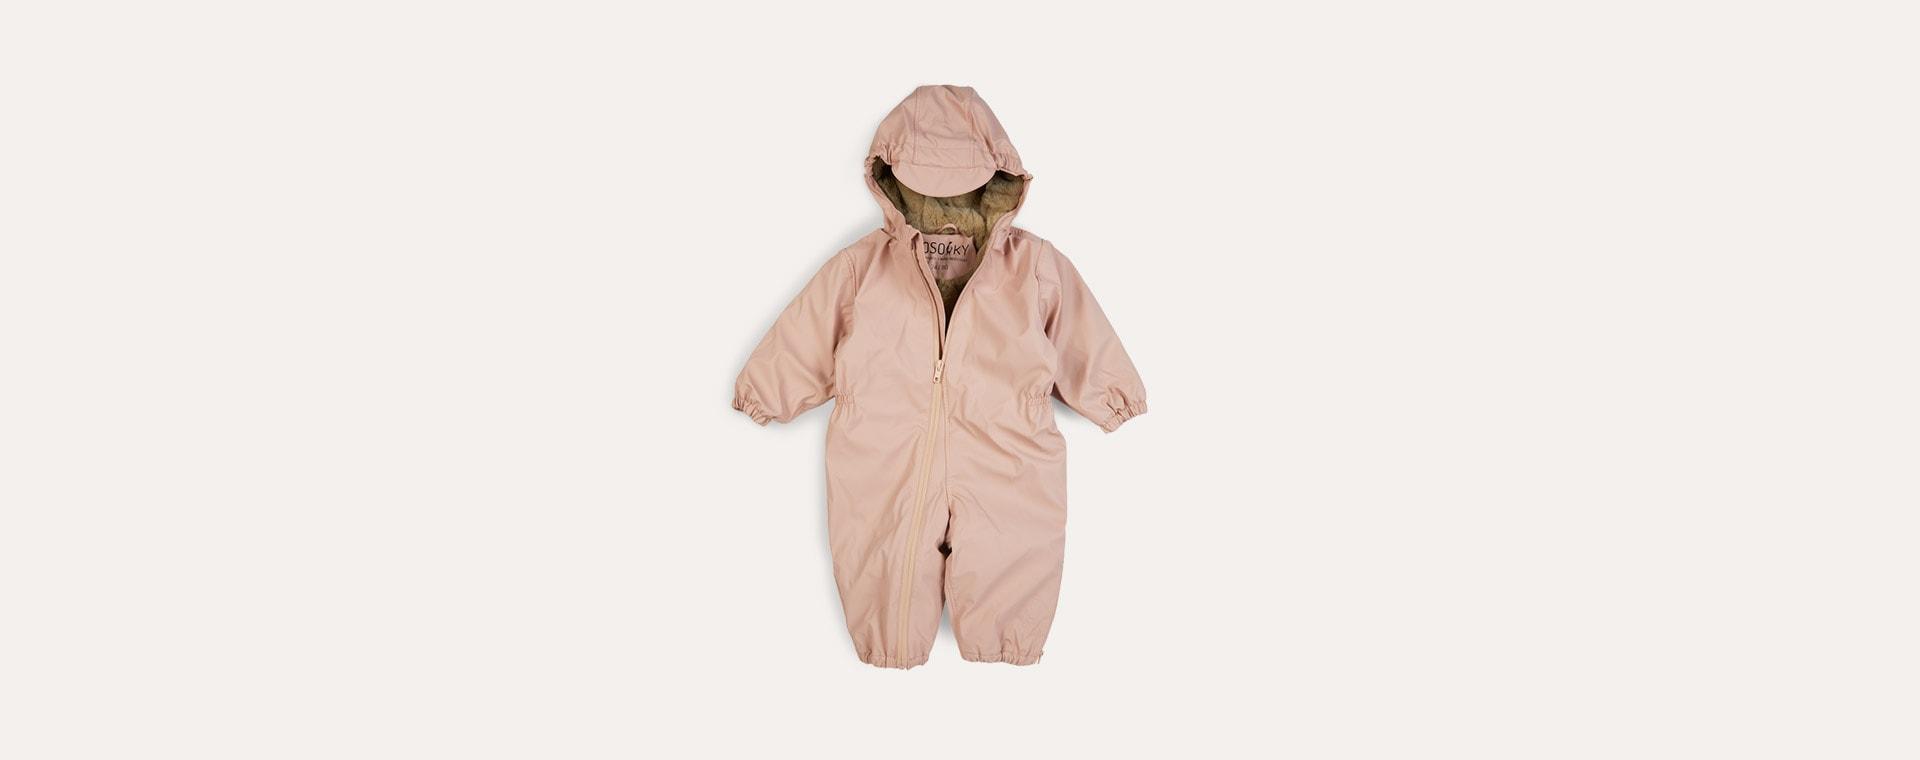 Evening Pink GOSOAKY Roger Rabbit Waterproof Unisex Onesie